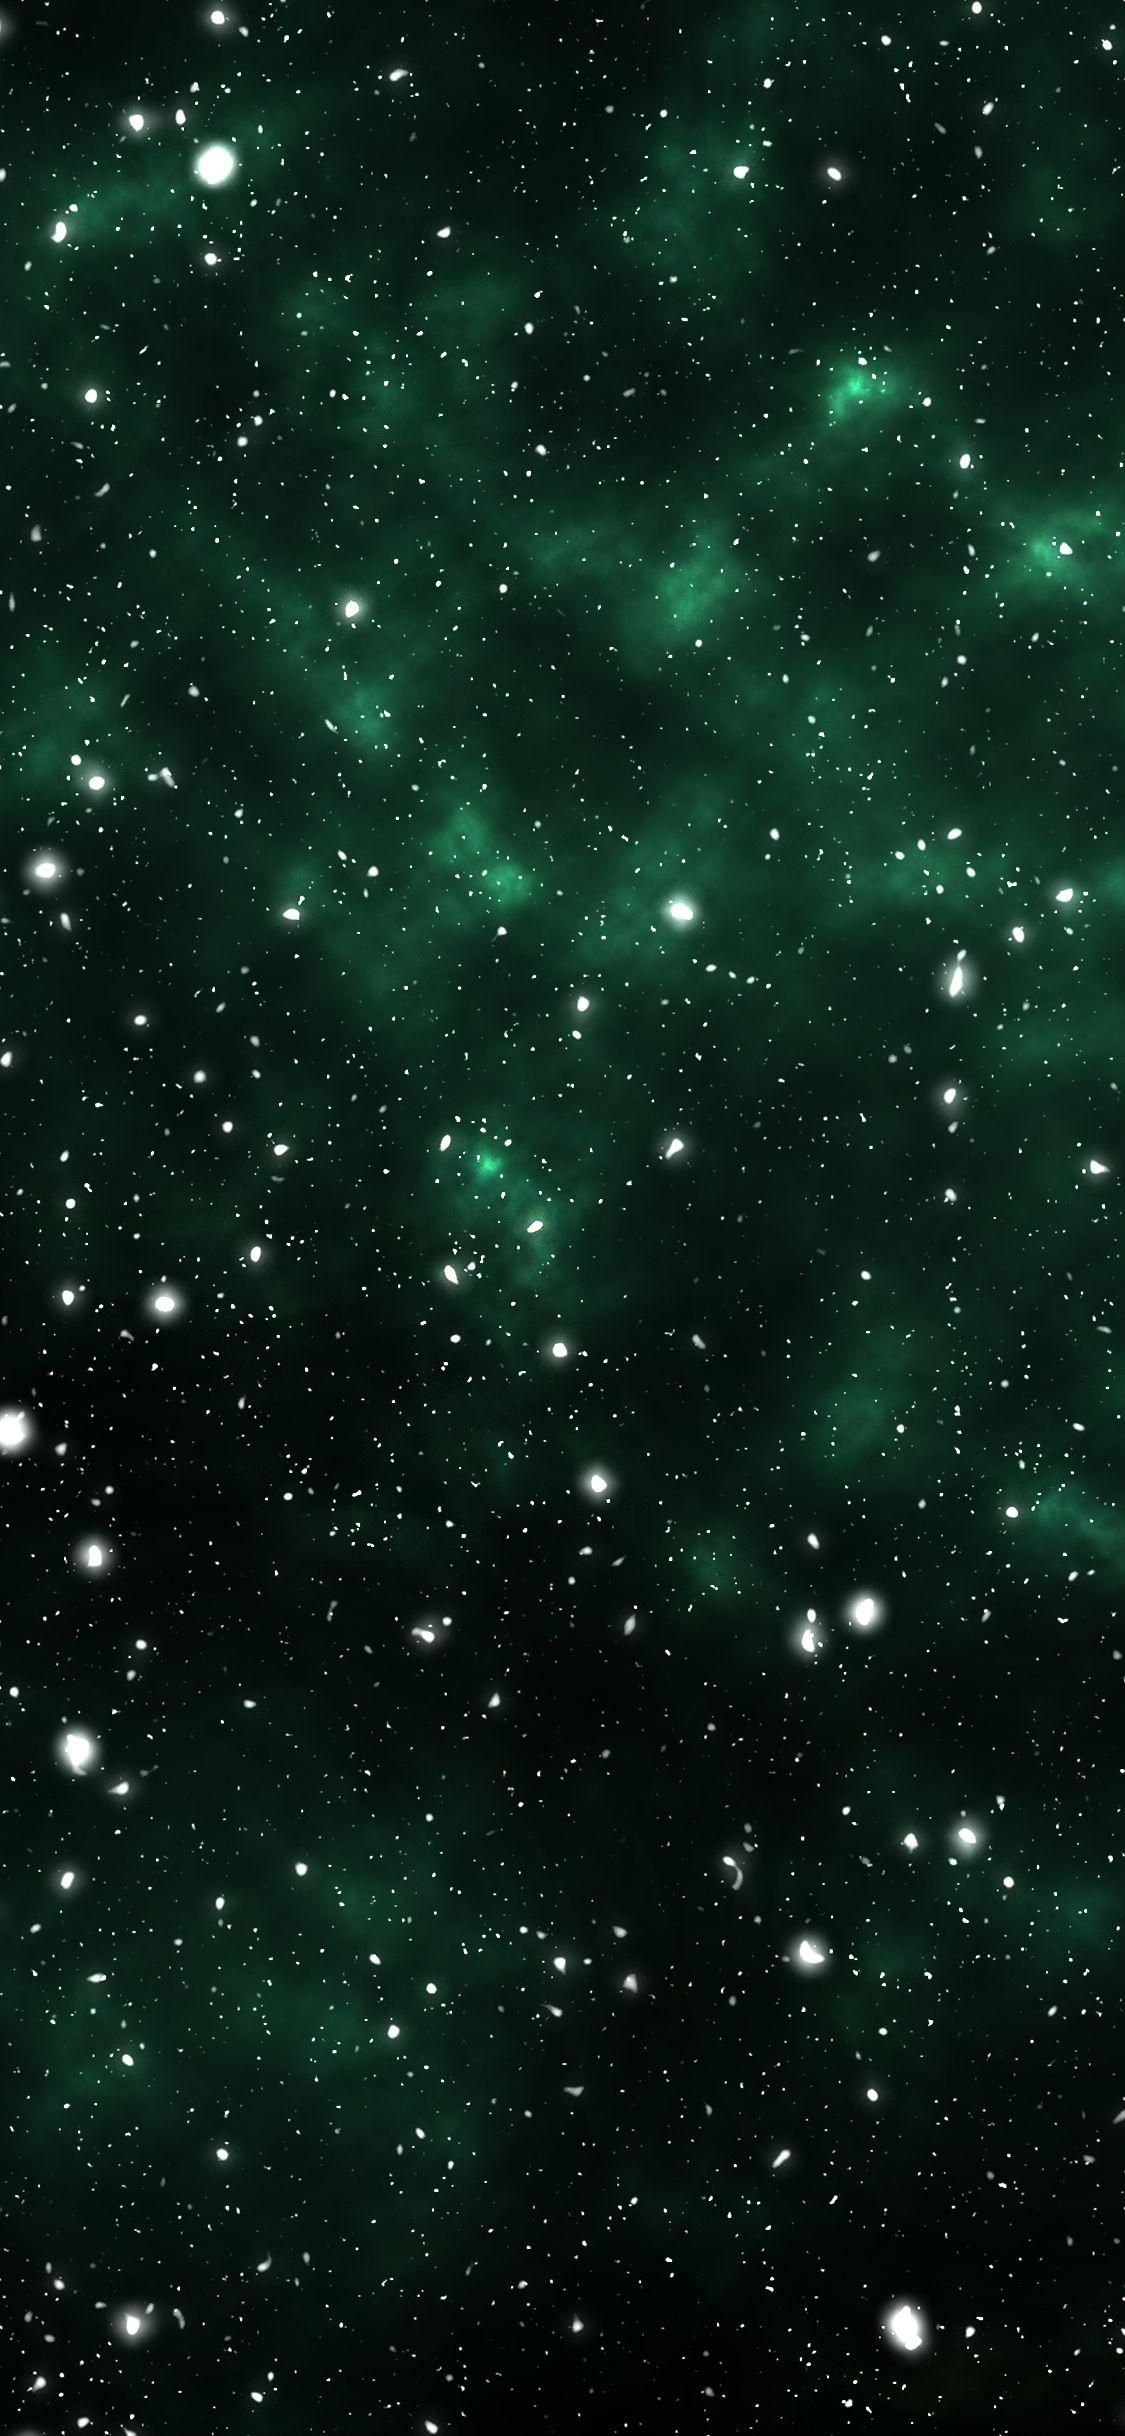 Galaxy Wallpaper 4k Hd Wallpaper Iphone Love Nature Iphone Wallpaper Cool Galaxy Wallpapers